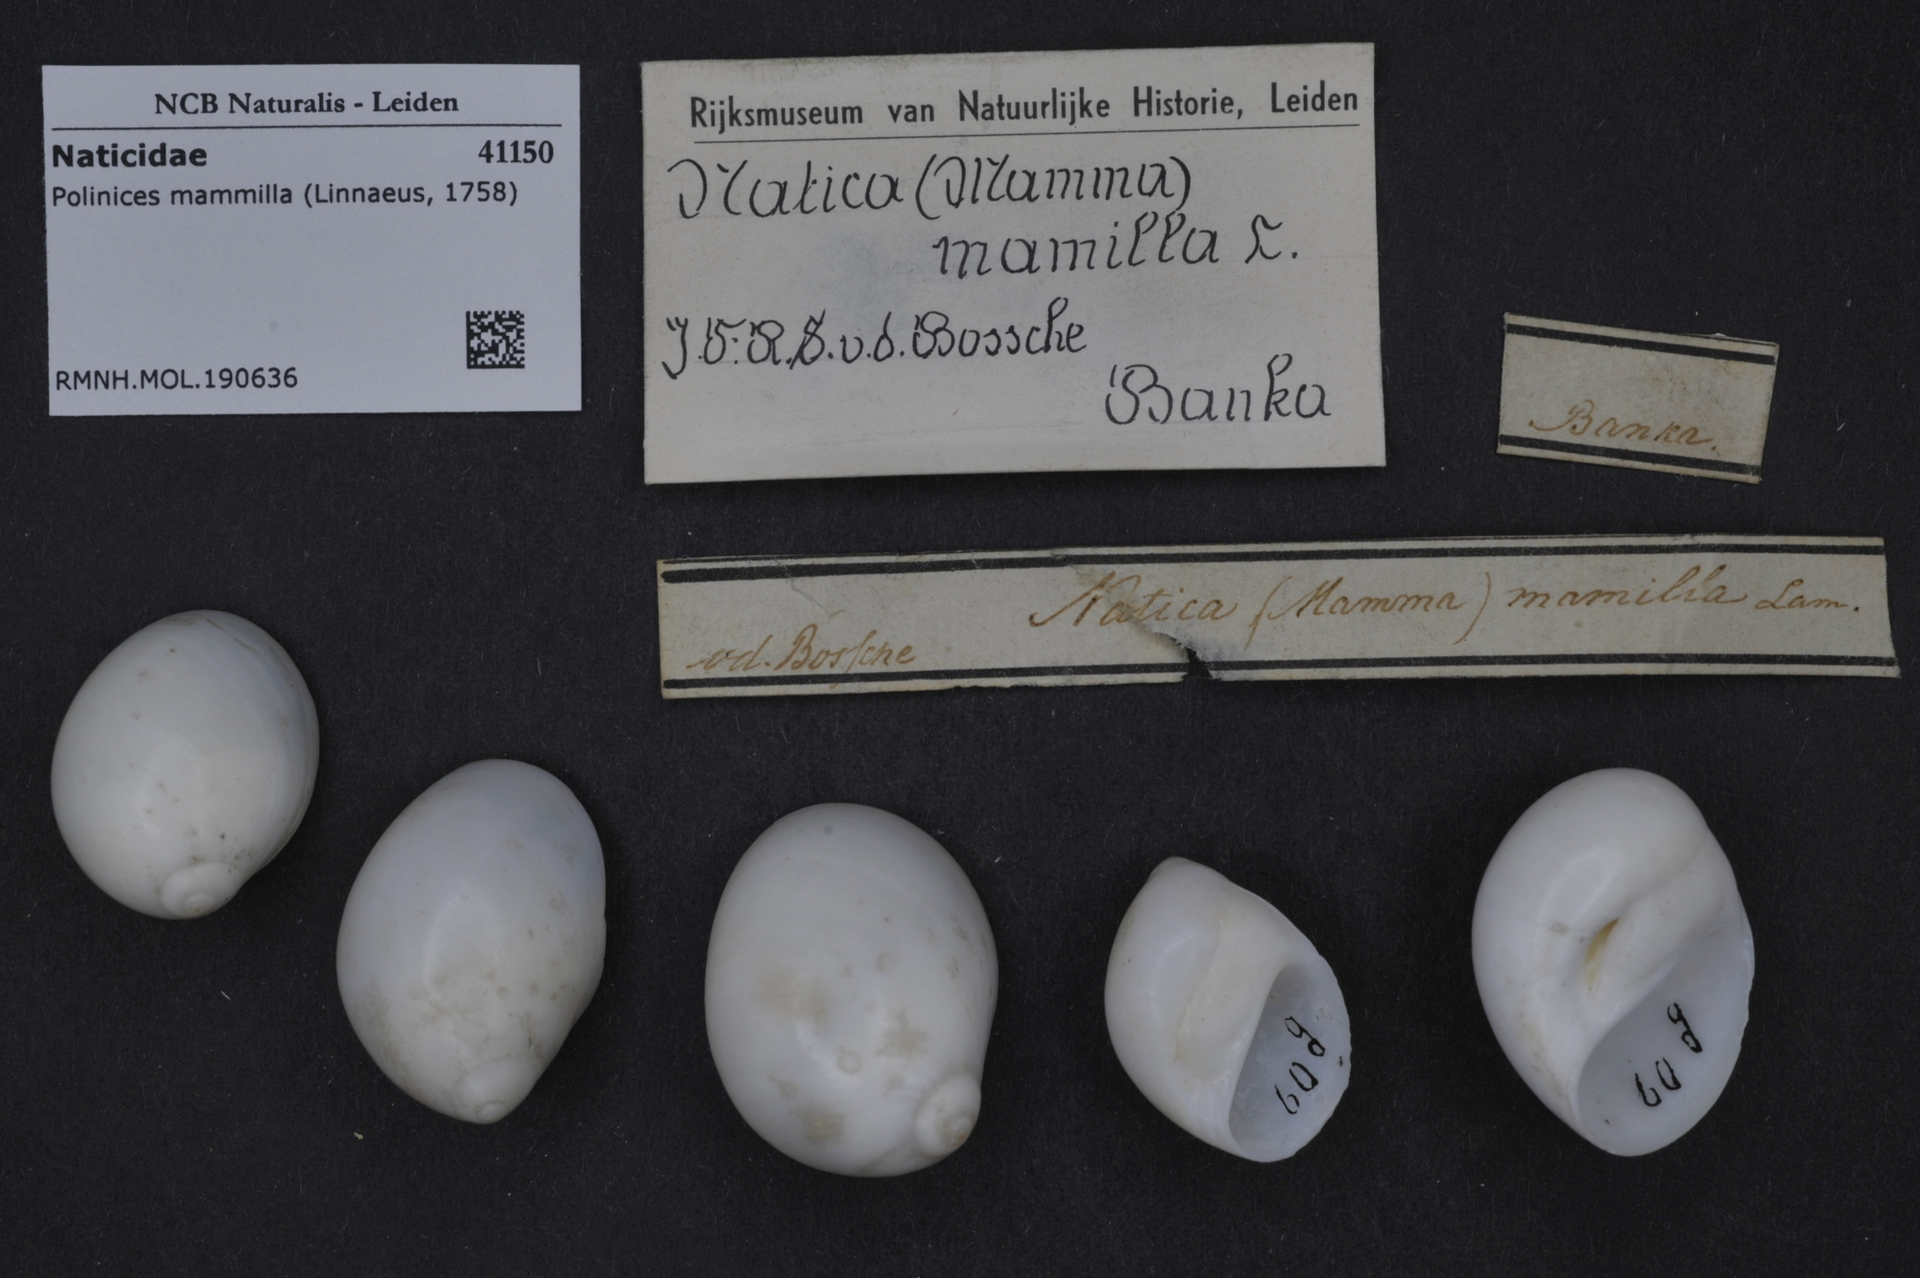 RMNH.MOL.190636 | Polinices mammilla (Linnaeus, 1758)